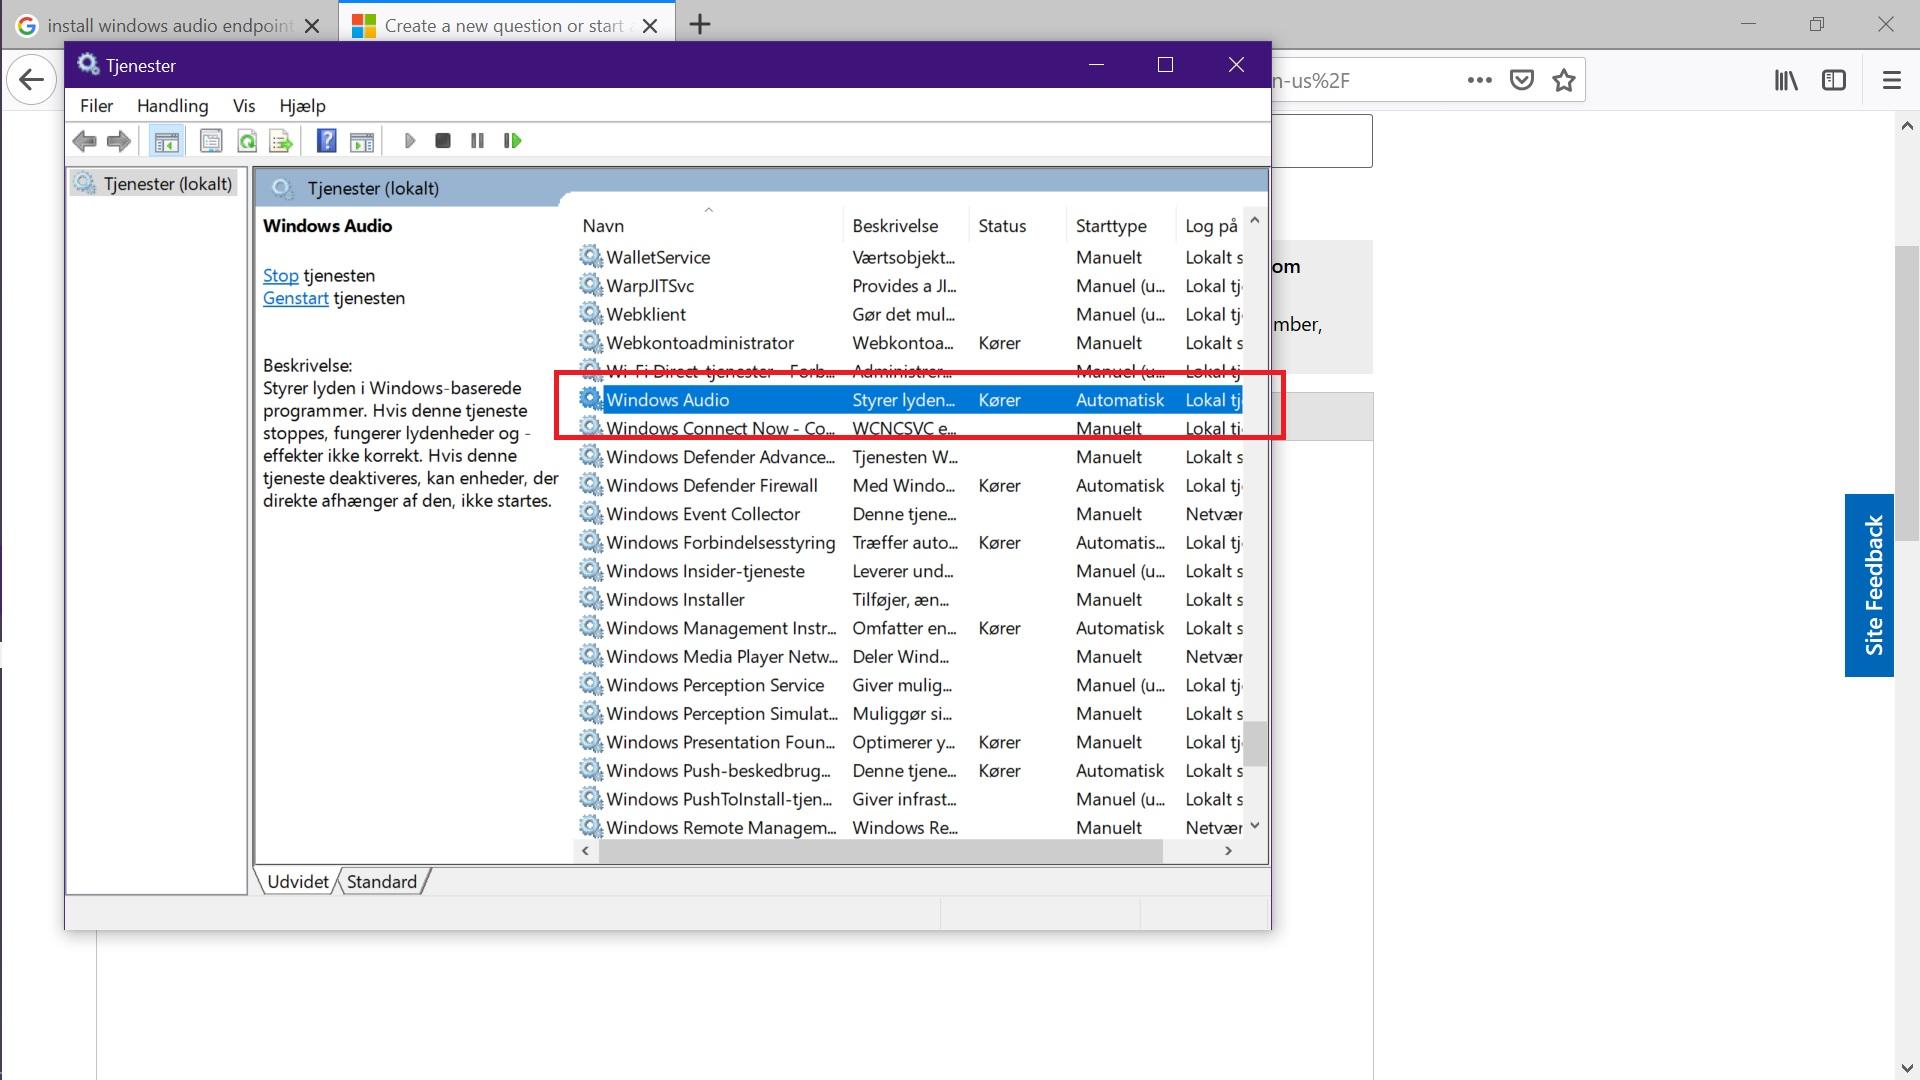 Windows Audio Endpoint Builder 8186201b-aeed-4898-b822-95659c2debac?upload=true.jpg